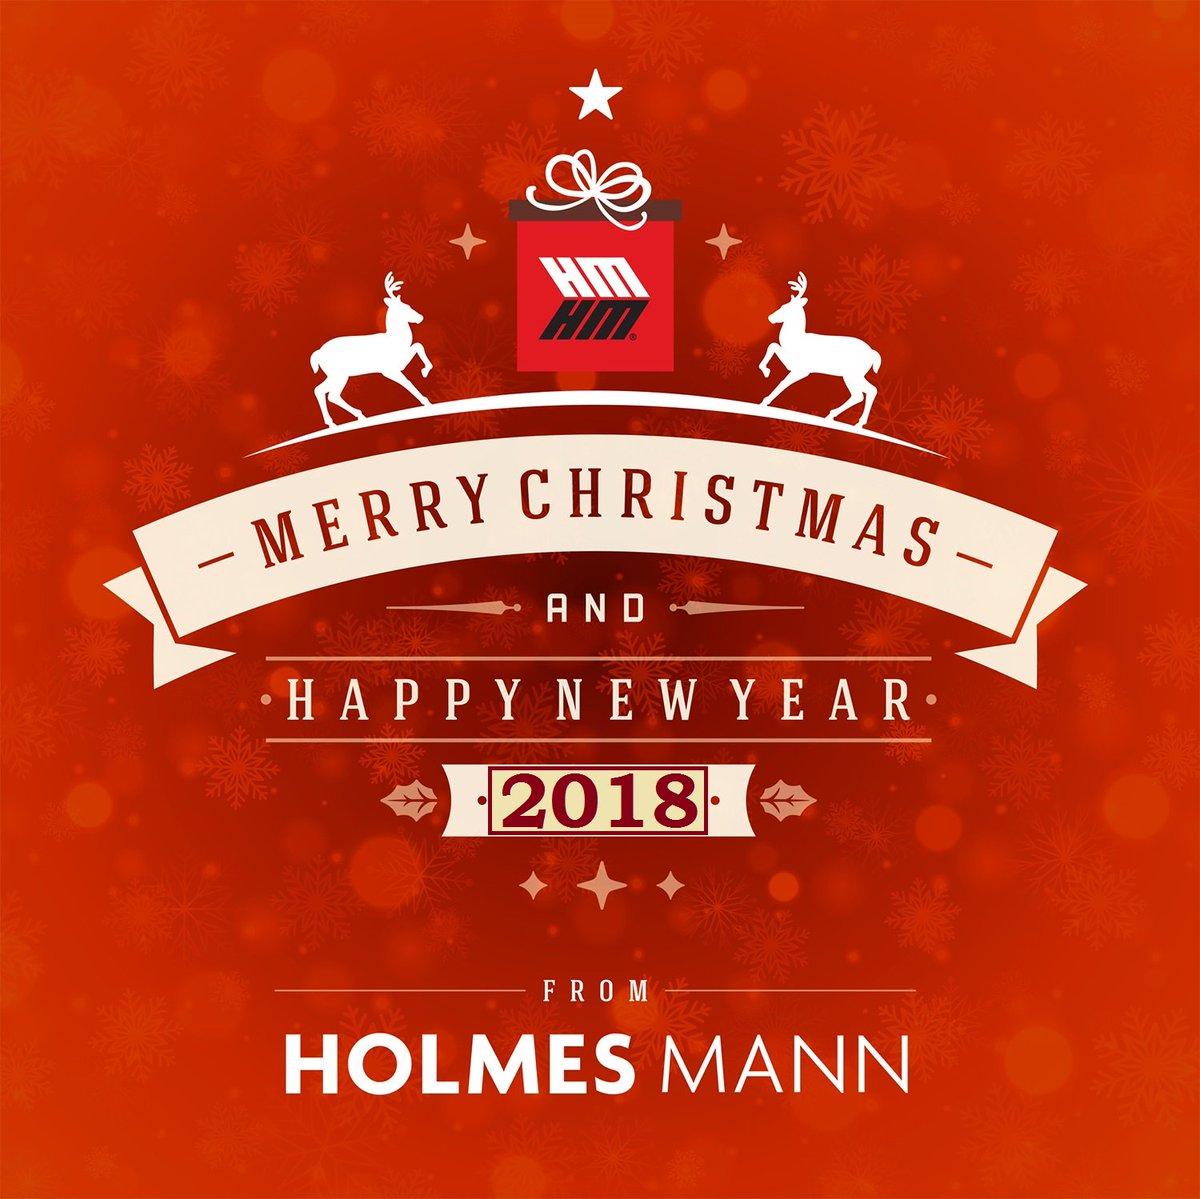 Holmes Mann (@HolmesMann) | Twitter